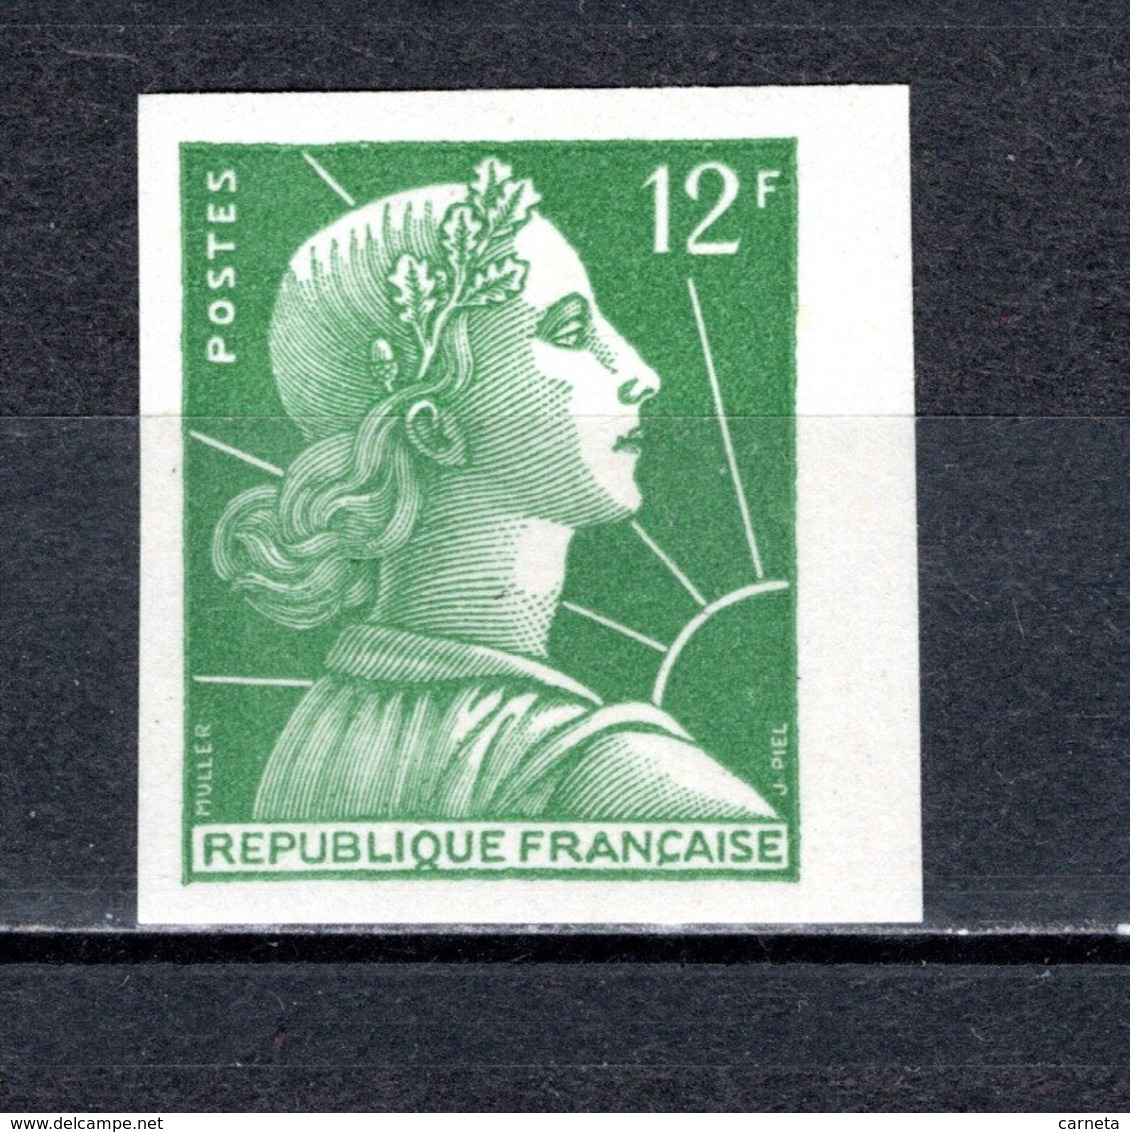 FRANCE  N° 1010b  NON DENTELE NEUF SANS CHARNIERE  COTE 270.00€  MARIANNE DE MULLER - France